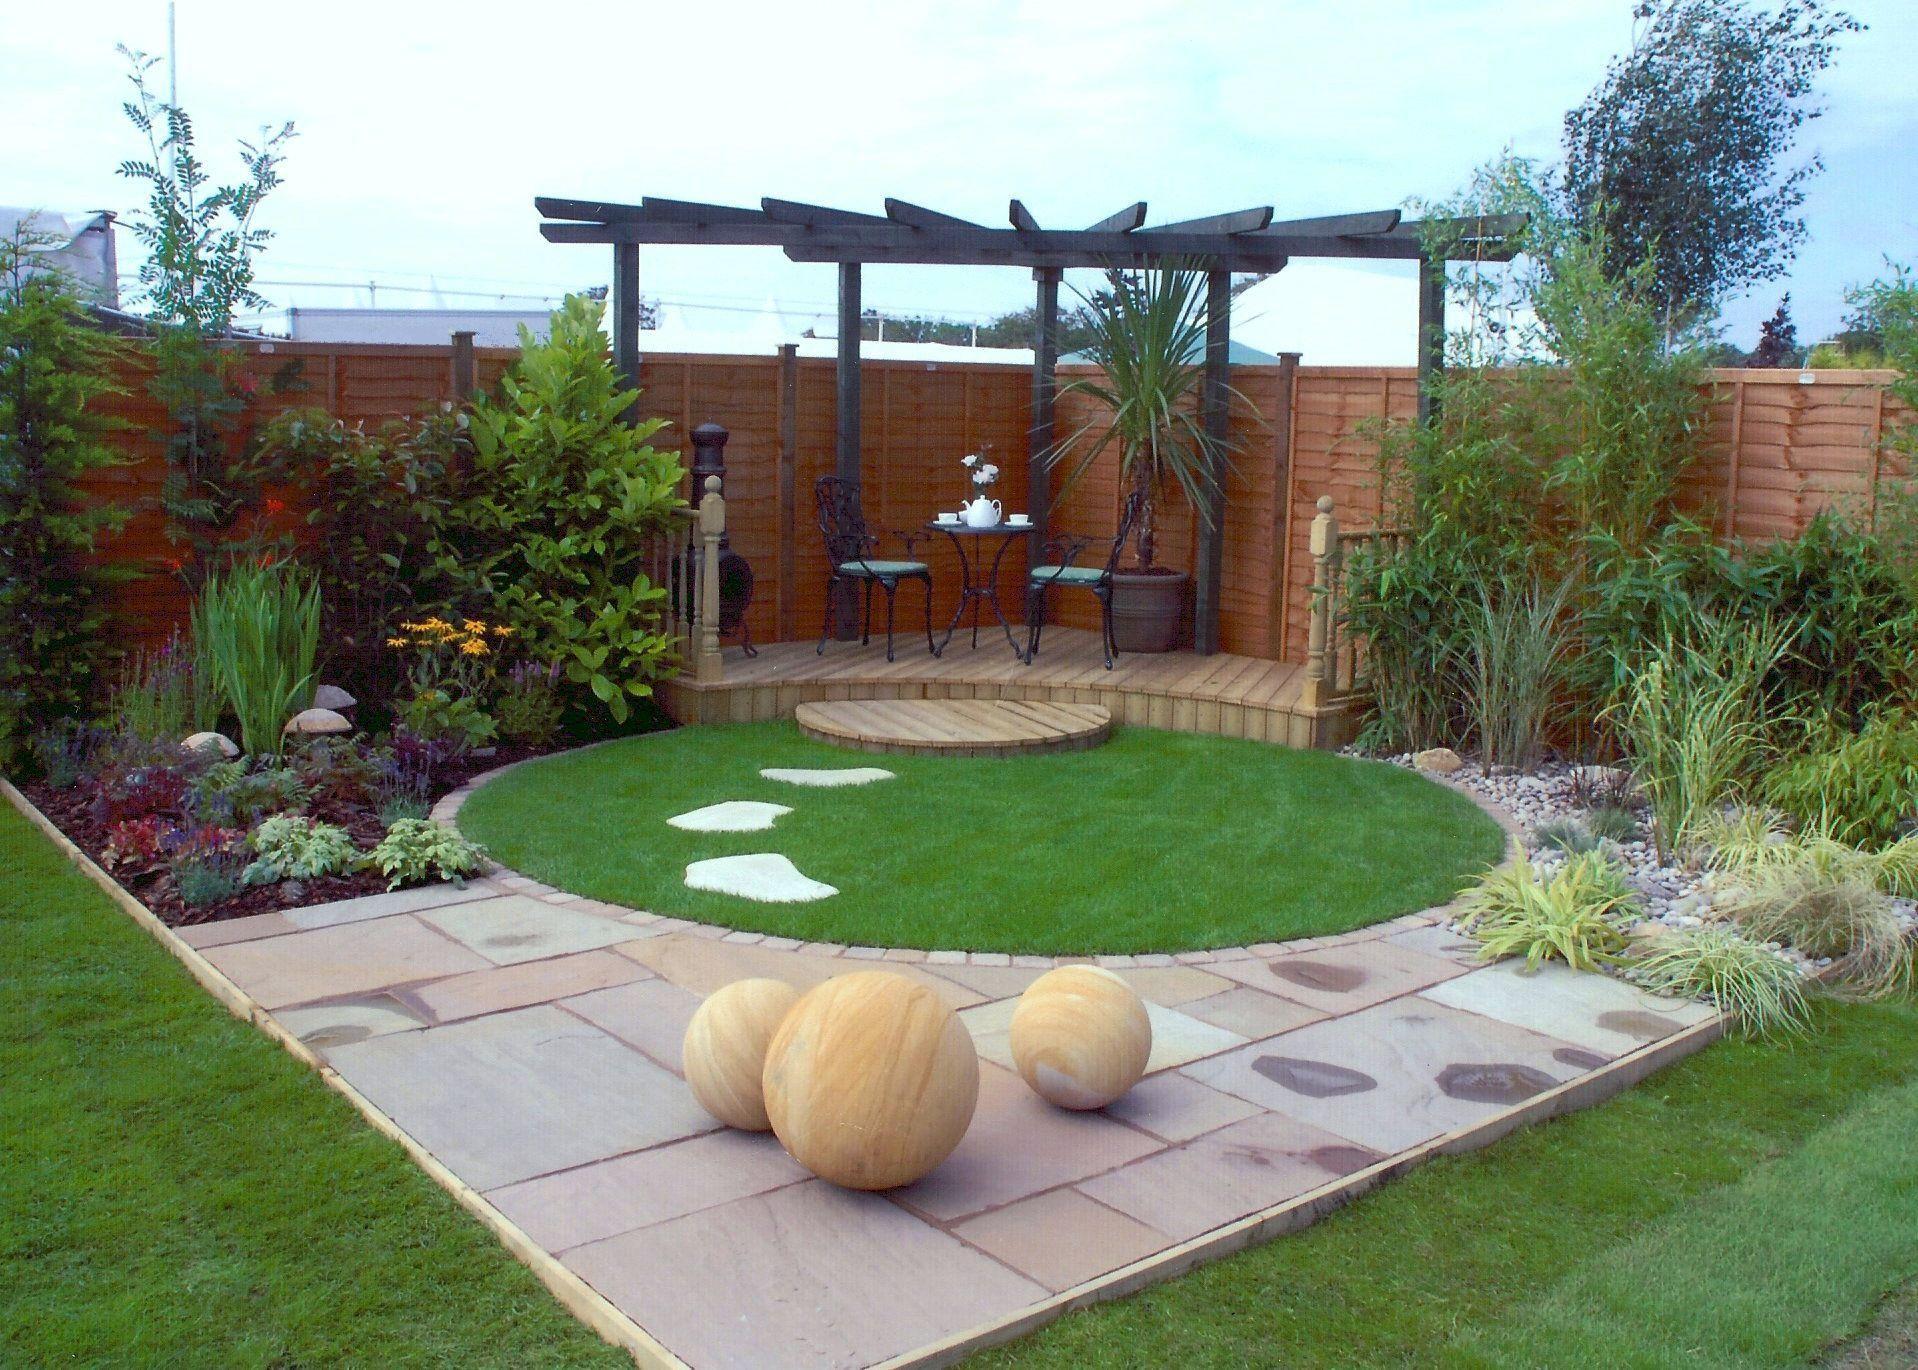 small garden google search best outdoor landscaping ideas images on pinterest cdececeaa